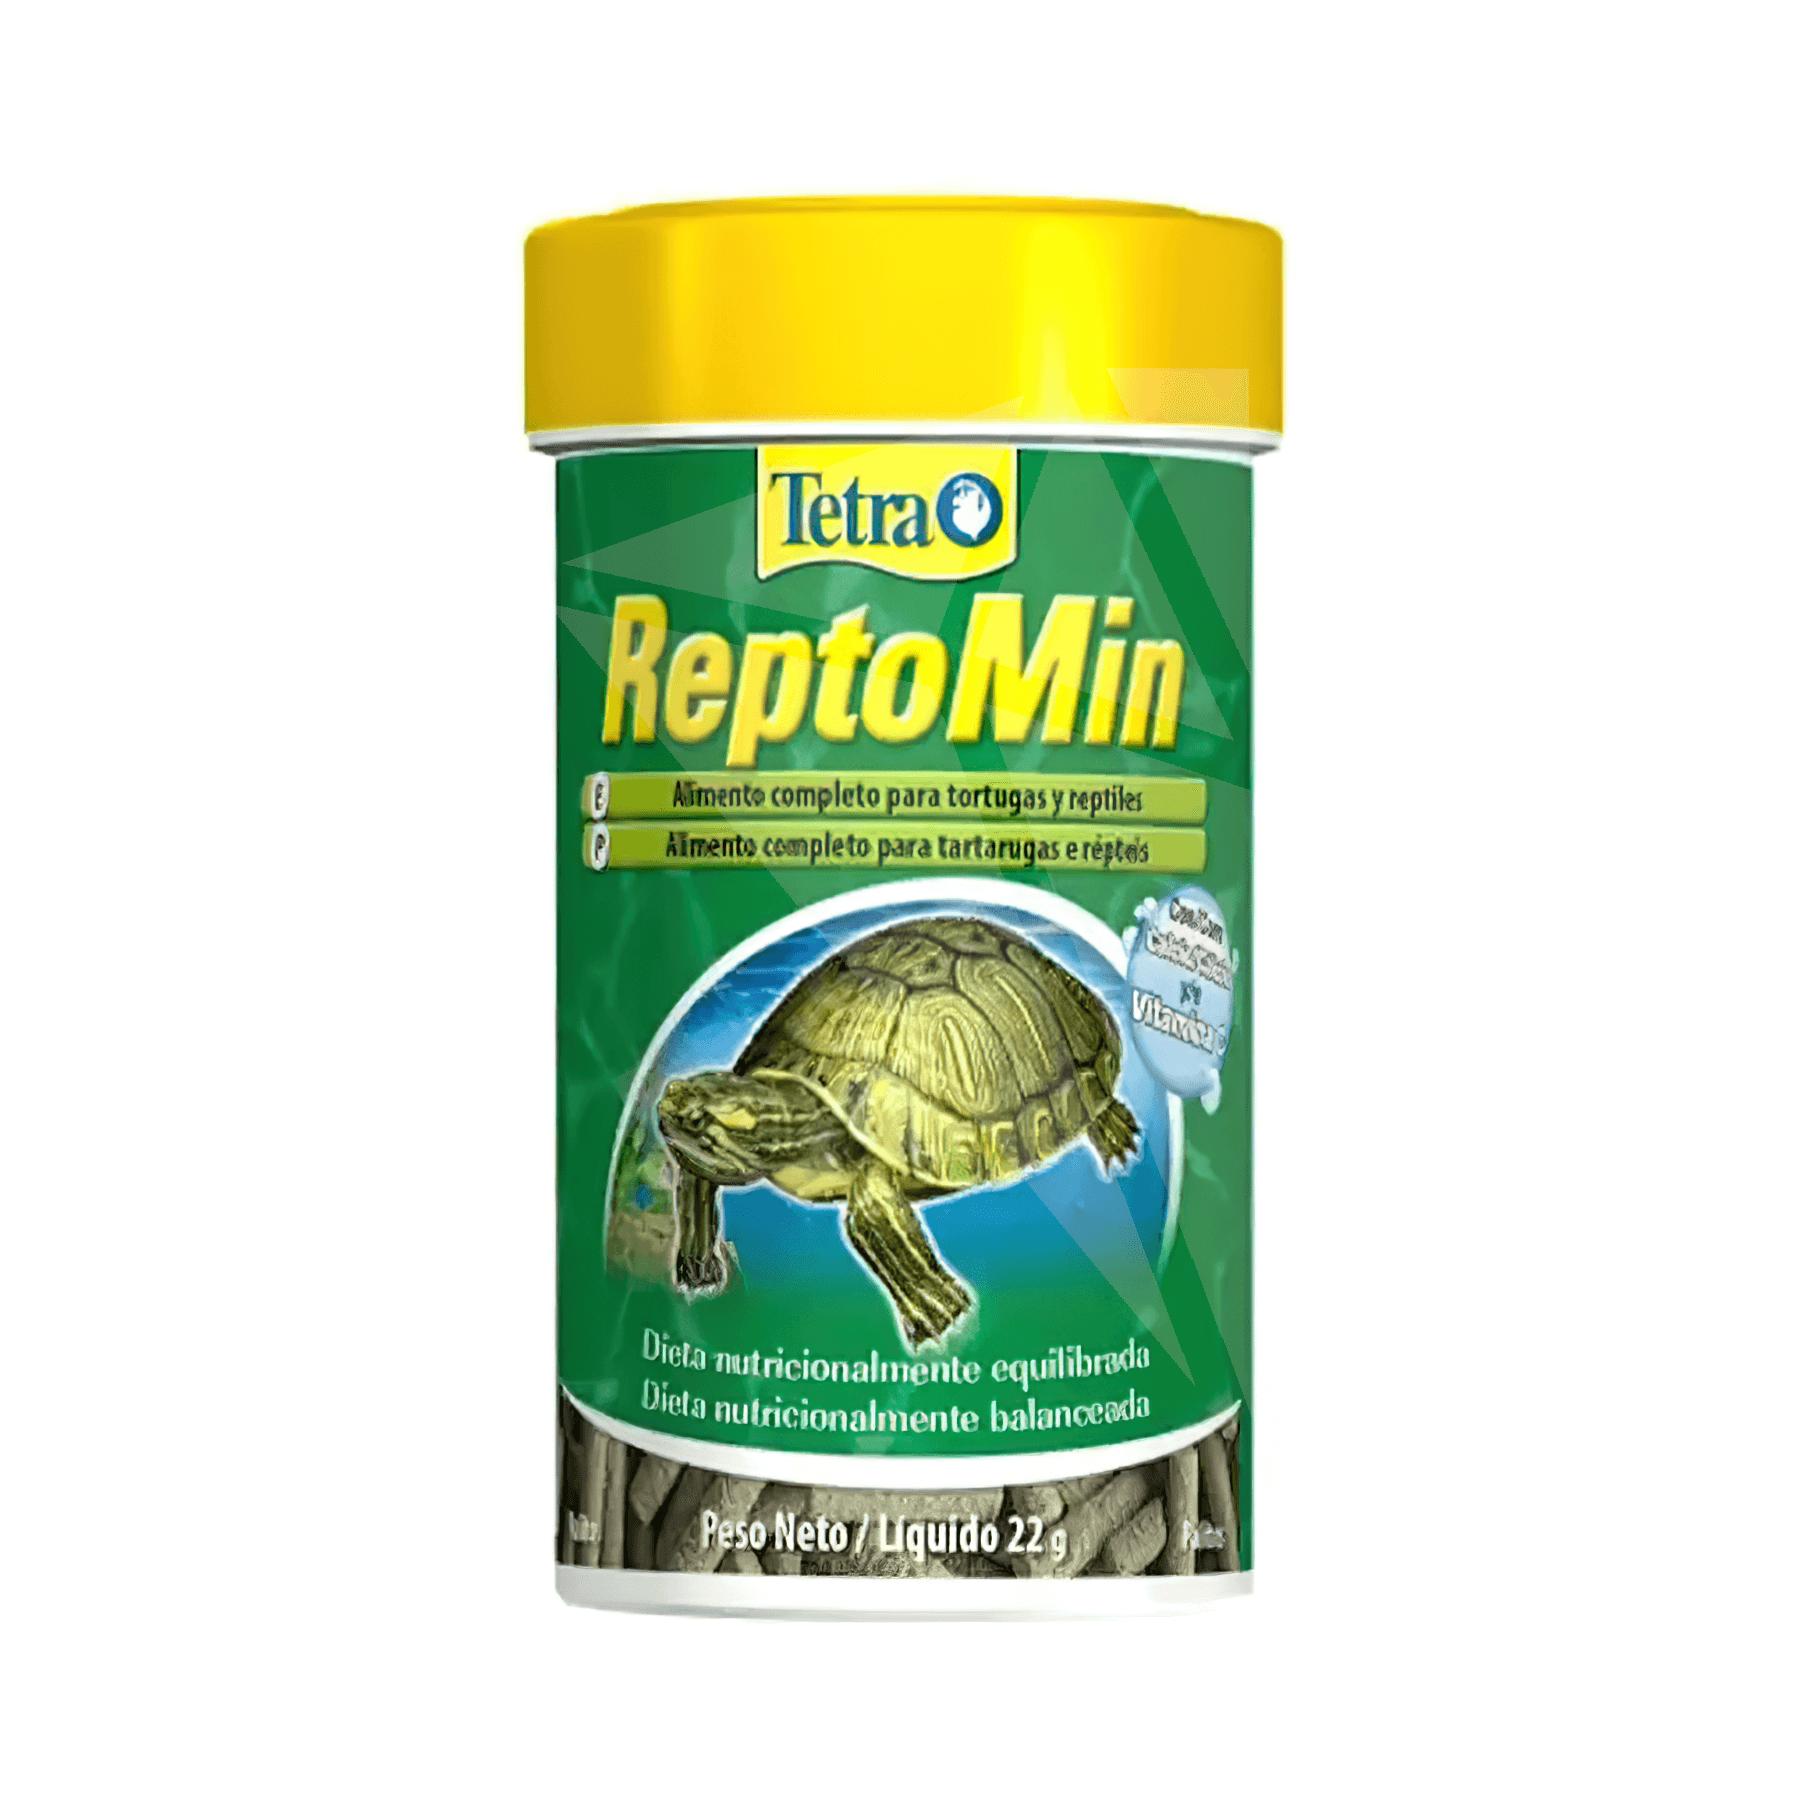 Tetra ReptoMin Floating Food Sticks 22g